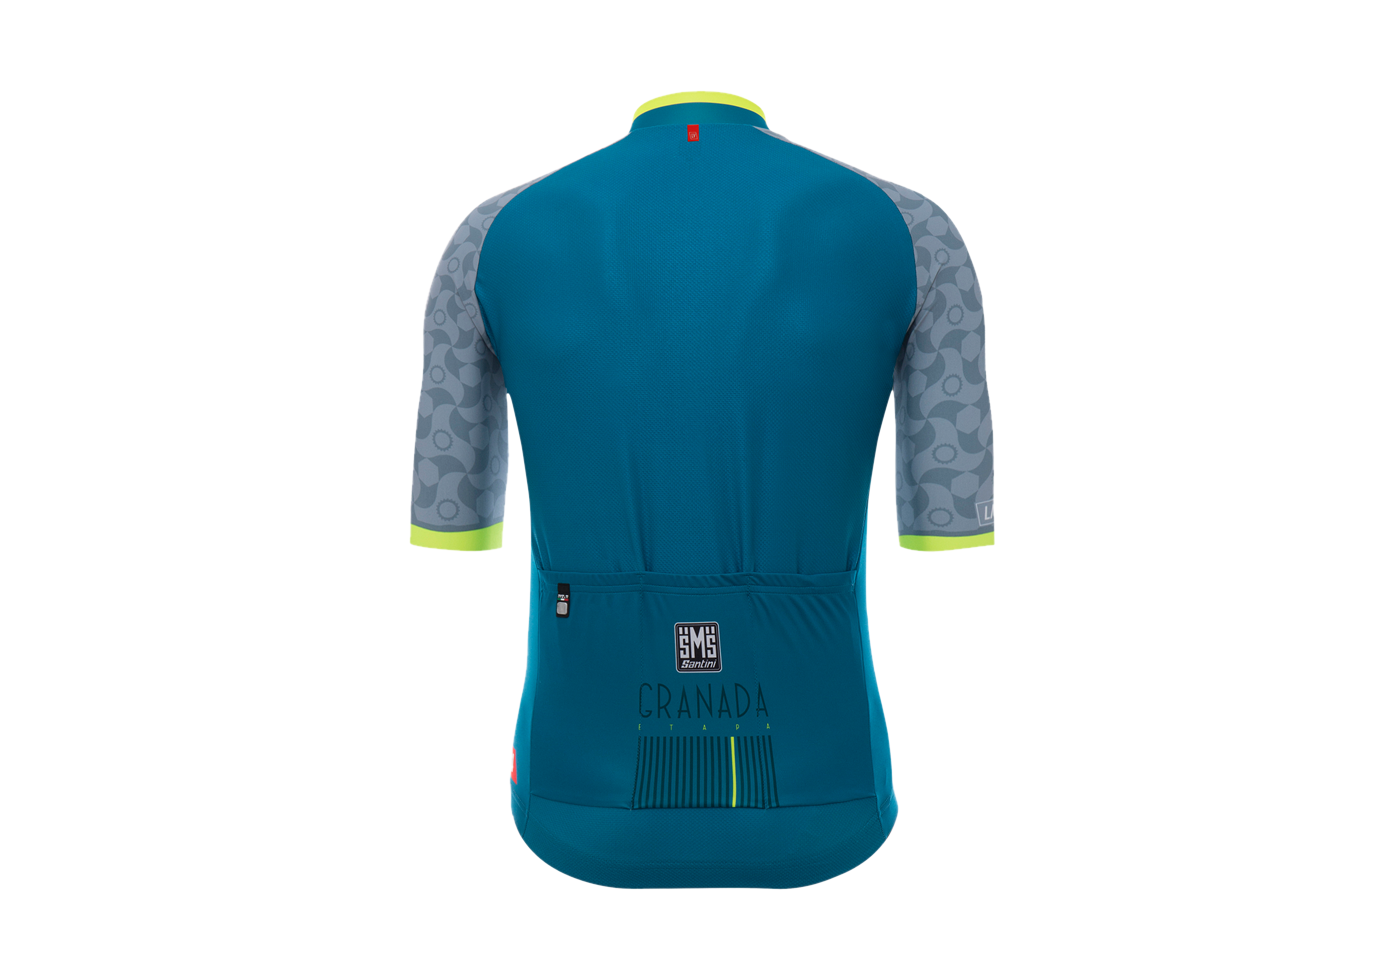 Maillot La Vuelta - Etapa Granada 2017 II